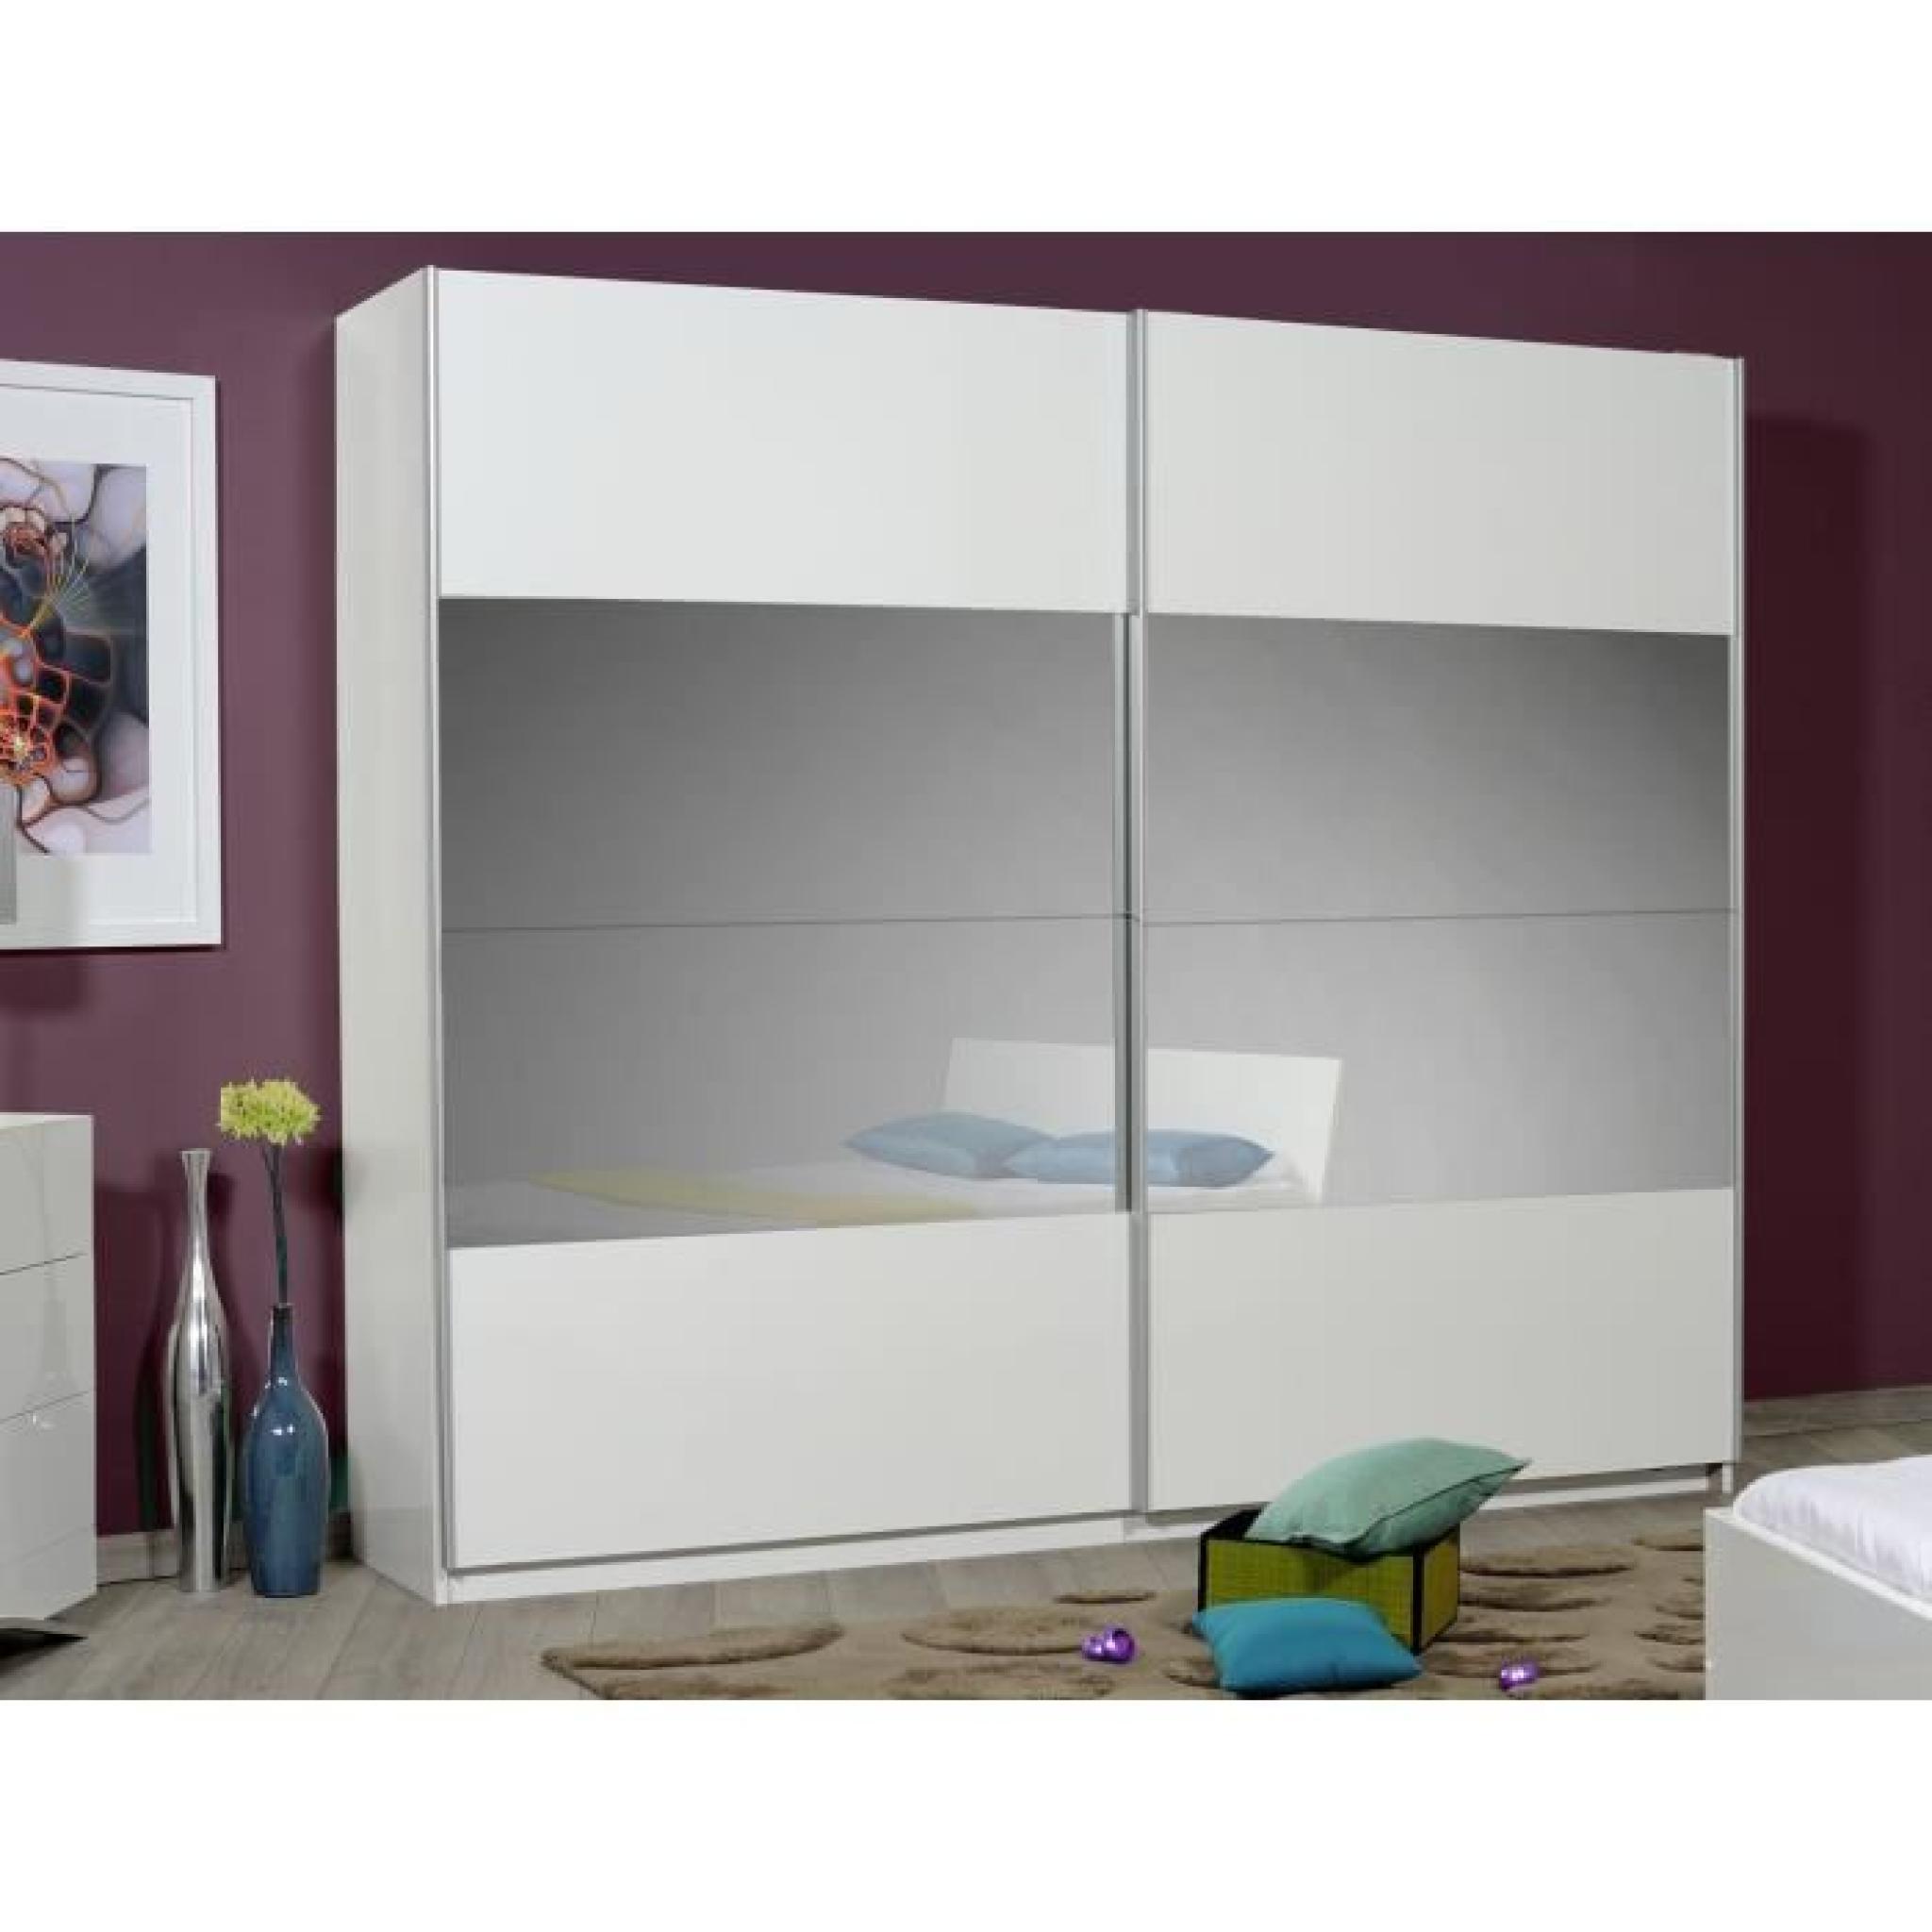 OPTIMUS MAXI Armoire Dressing 260 Cm Blanc AchatVente